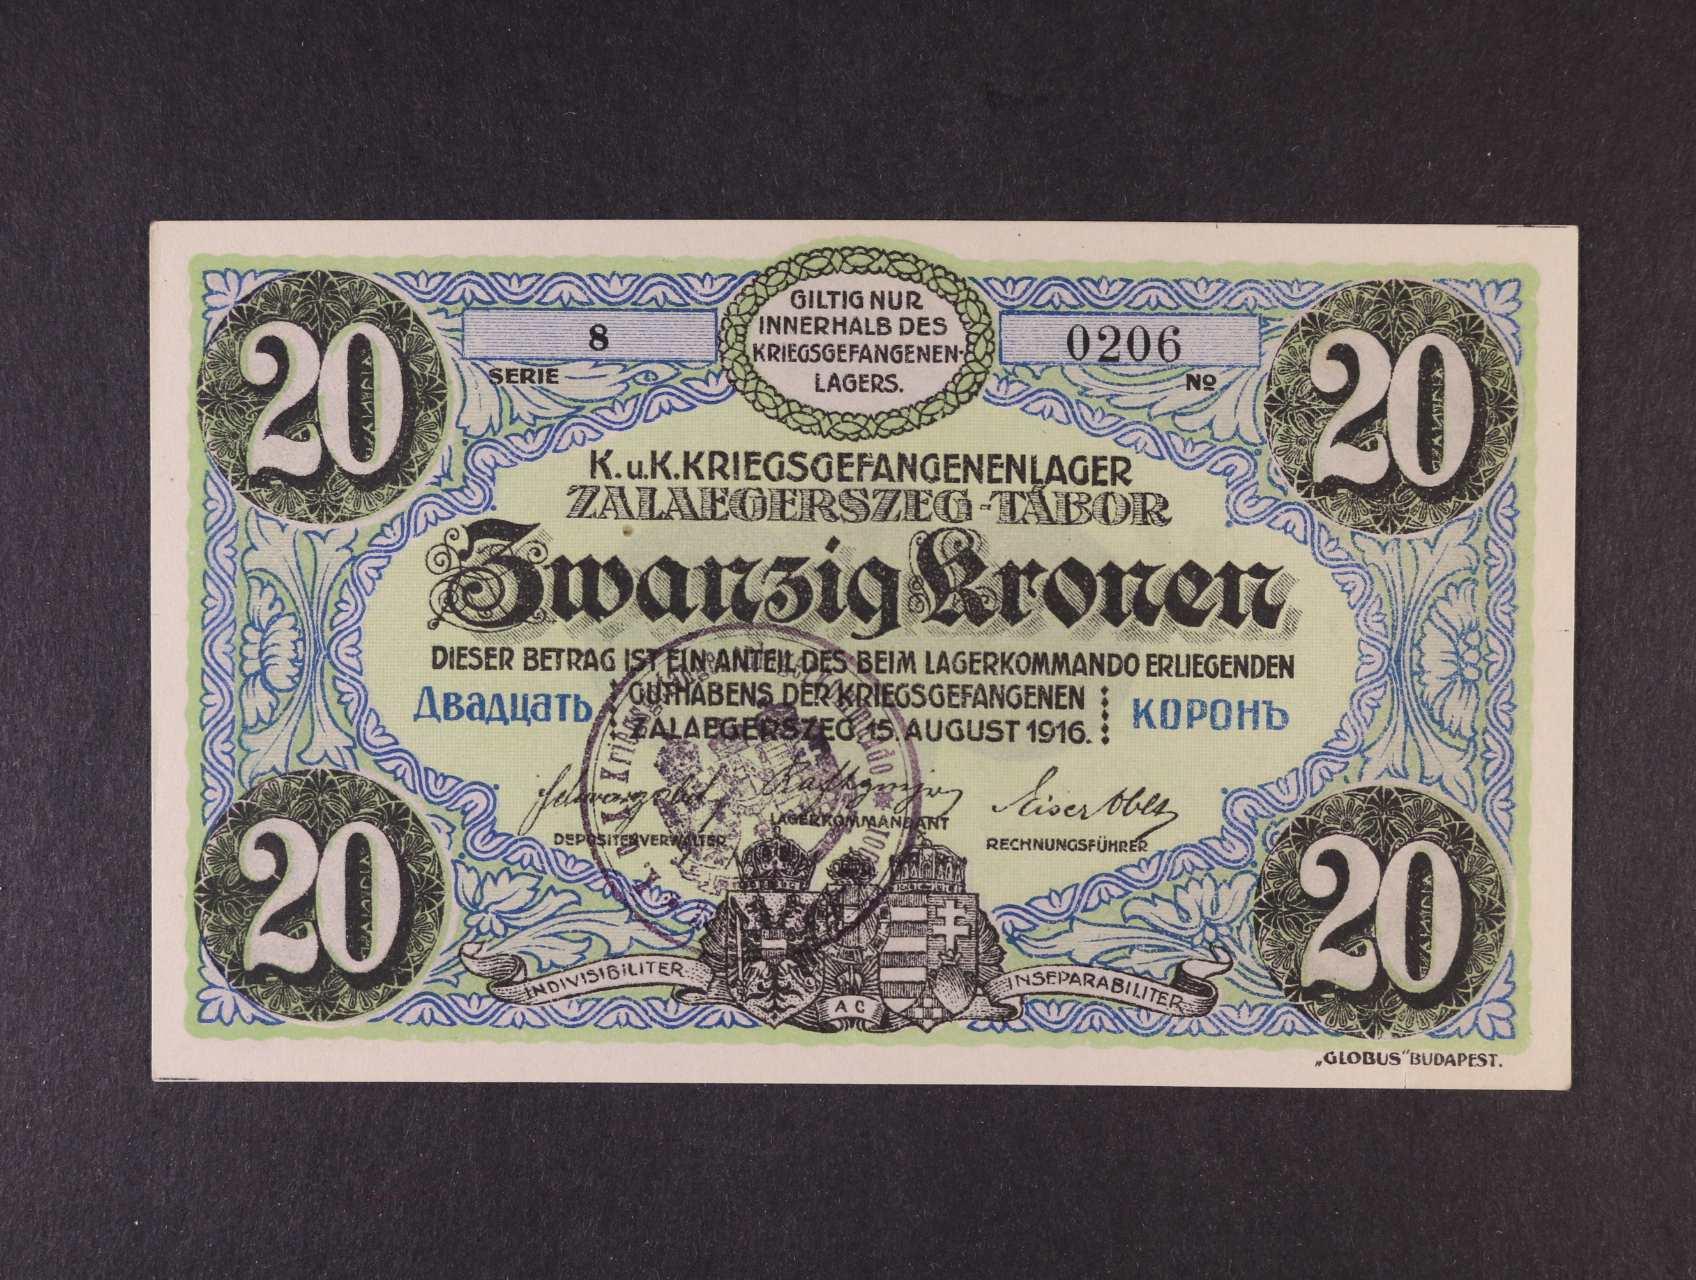 Zalaegerszeg (Maďarsko), 20 K 15.8.1916 s raz., Ri. 53.II.h1